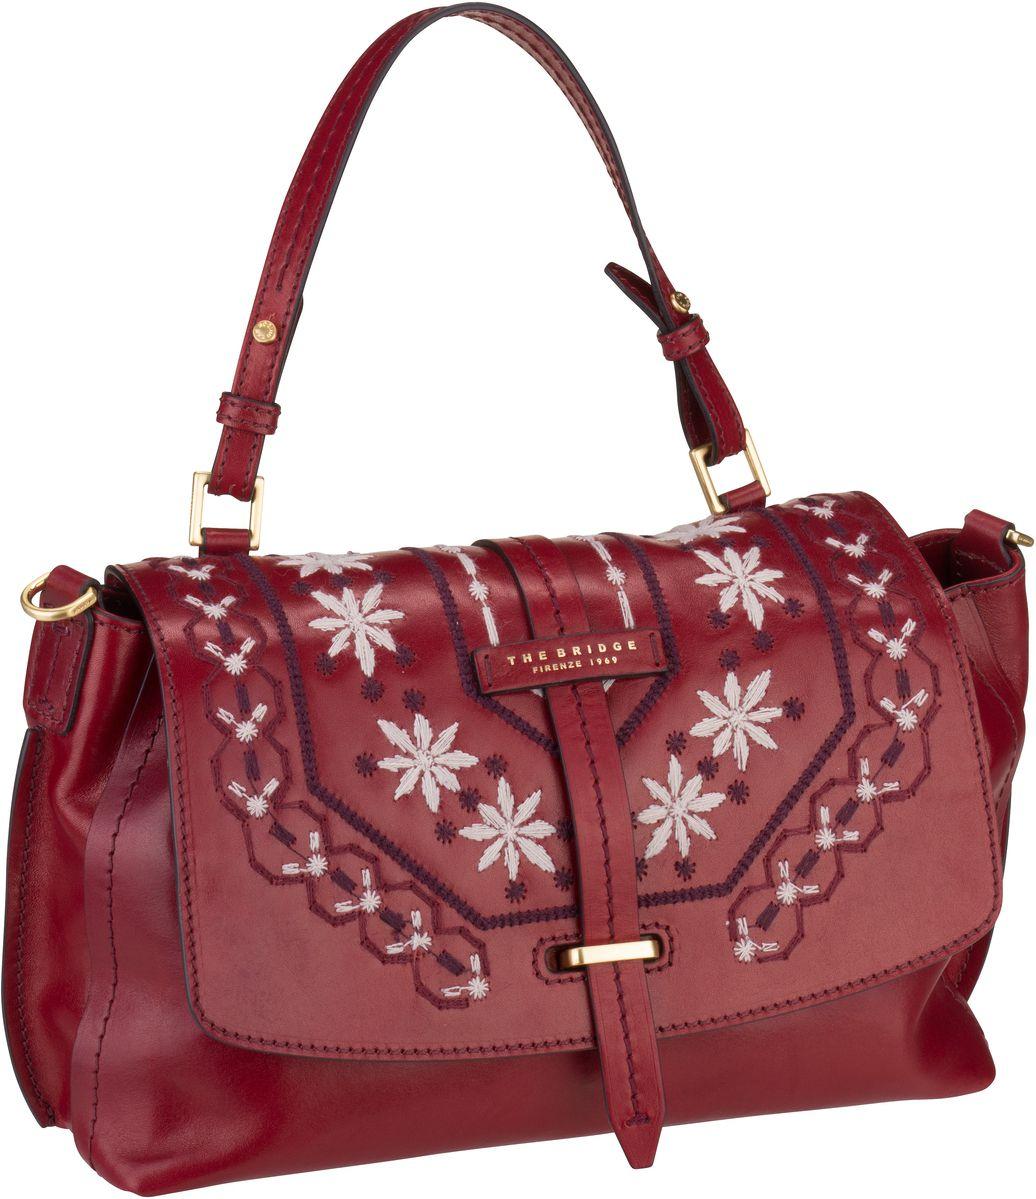 Handtasche Fiesole Handtasche 3407 Rosso Ribes/Oro